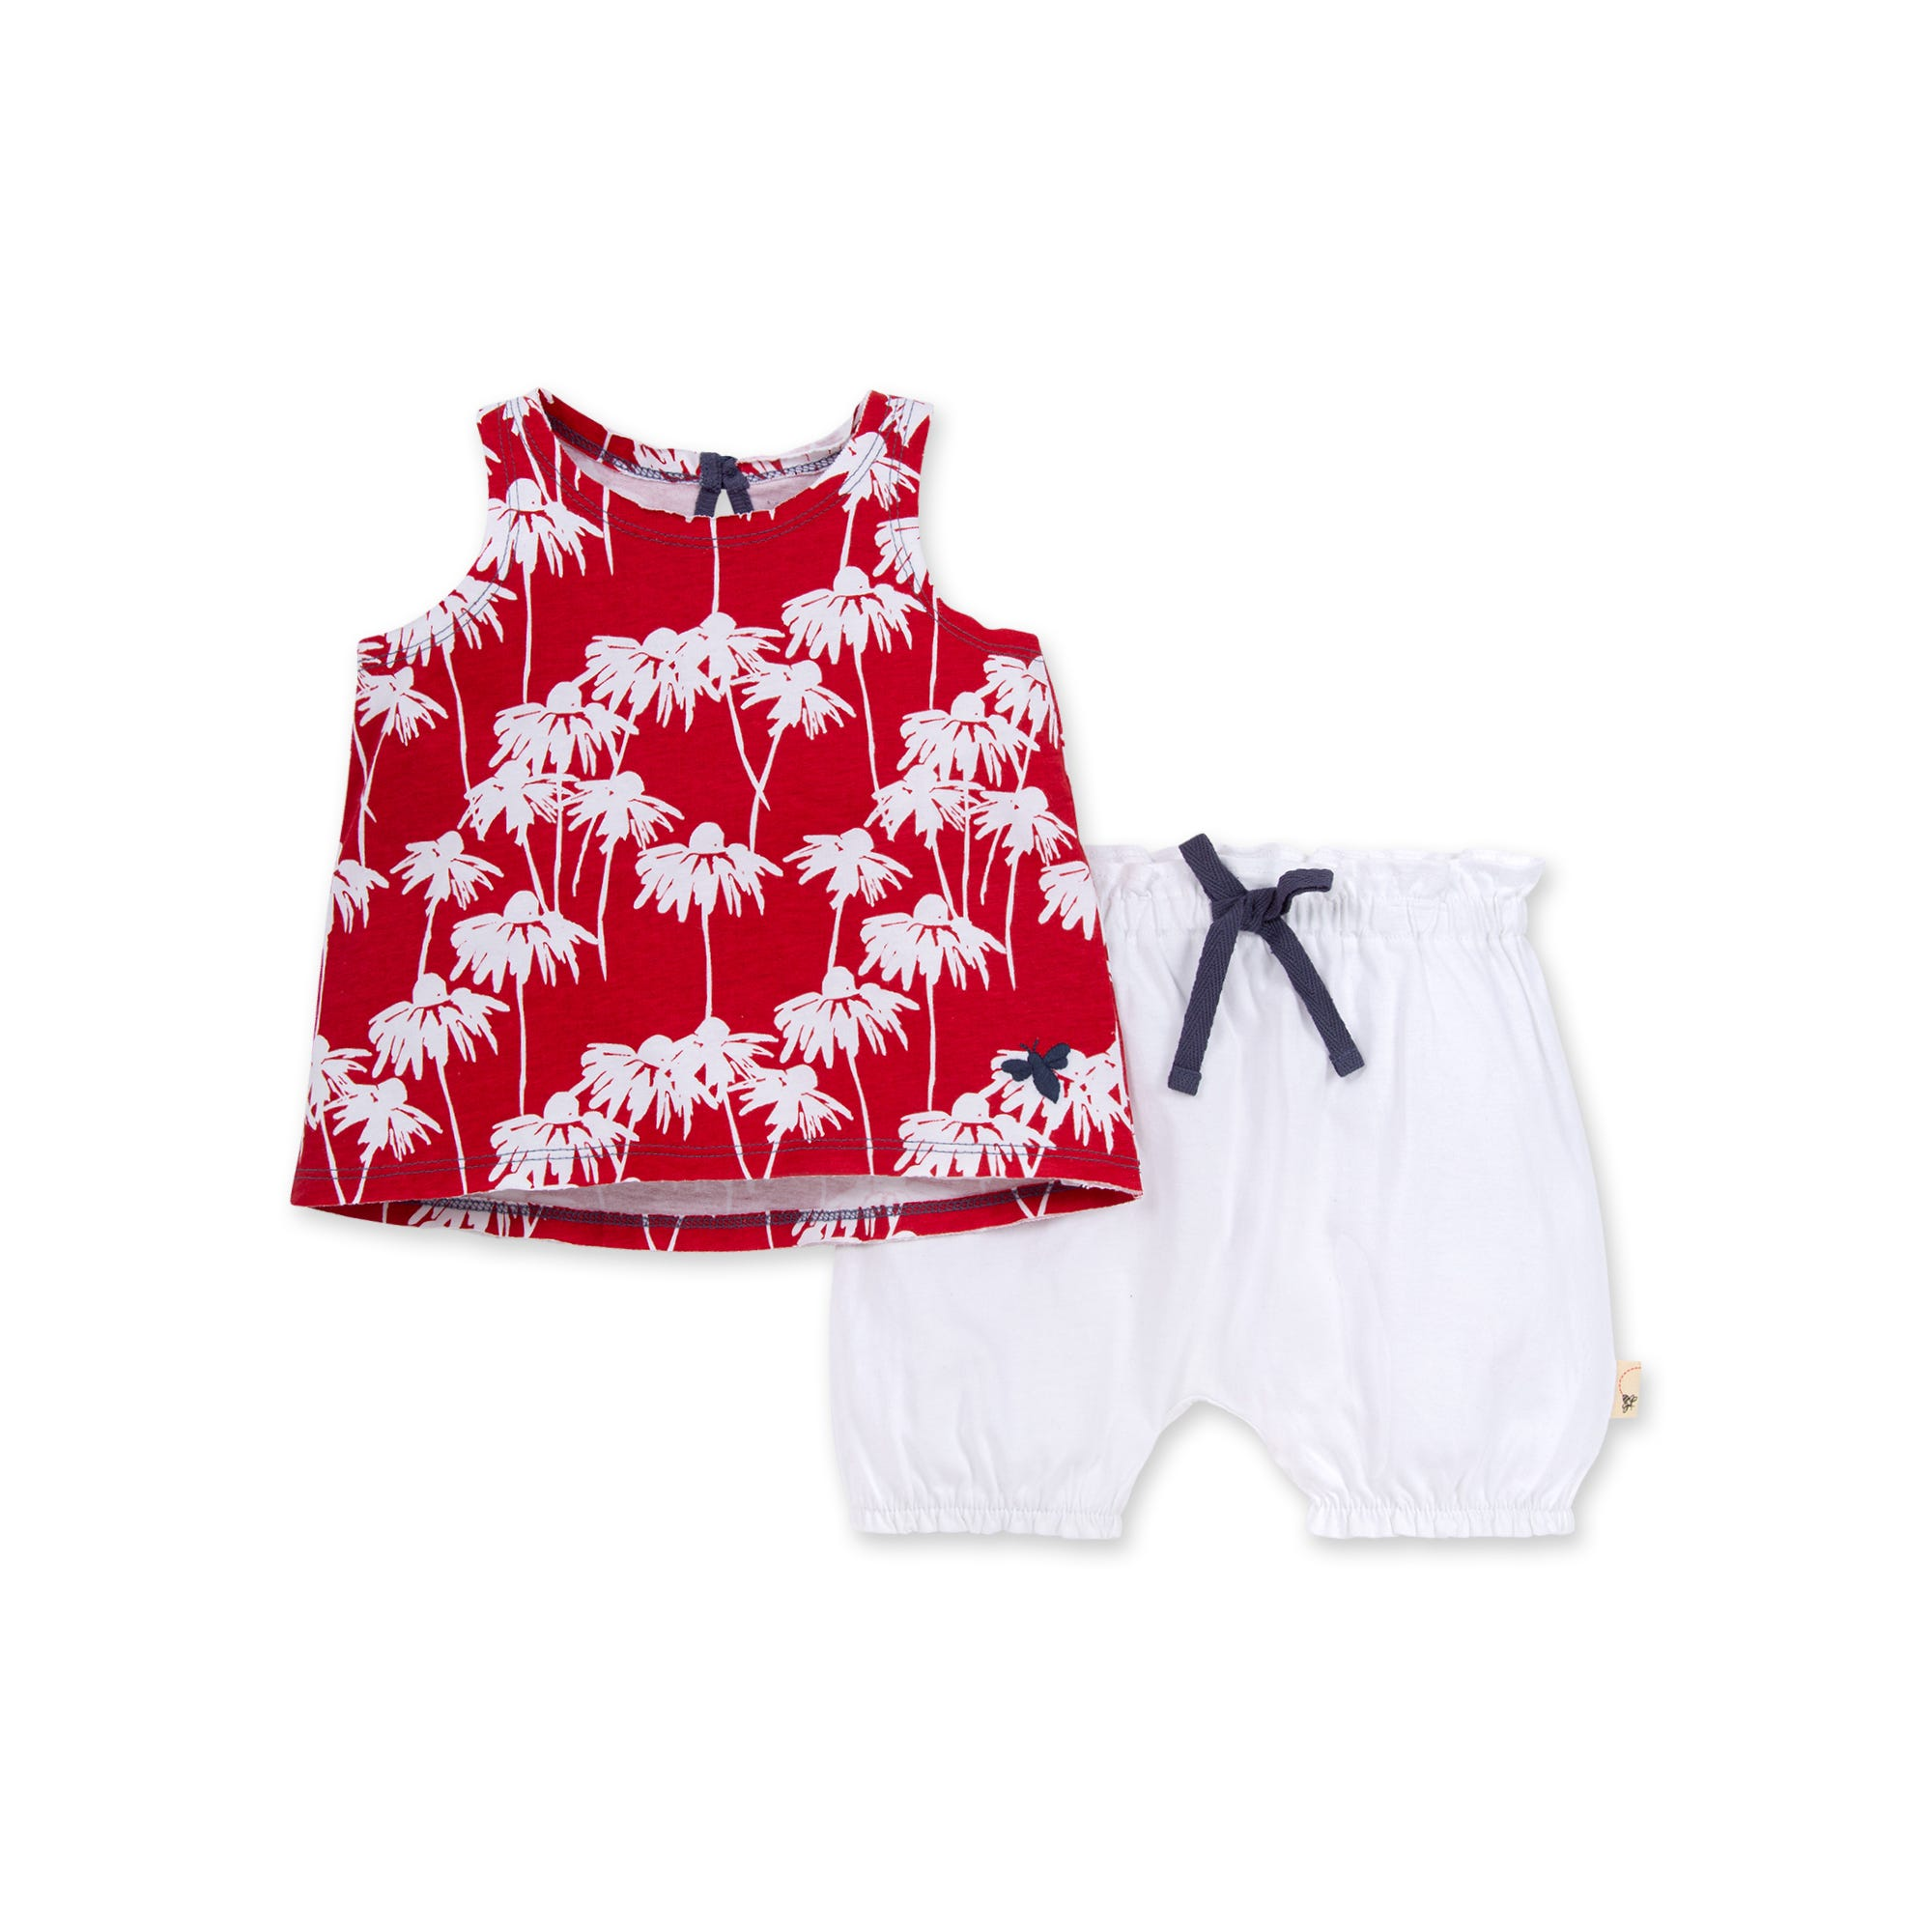 Burts Bees Baby Tank Tops 100/% Organic Cotton Girls Short Sleeve and Sleeveless Tees